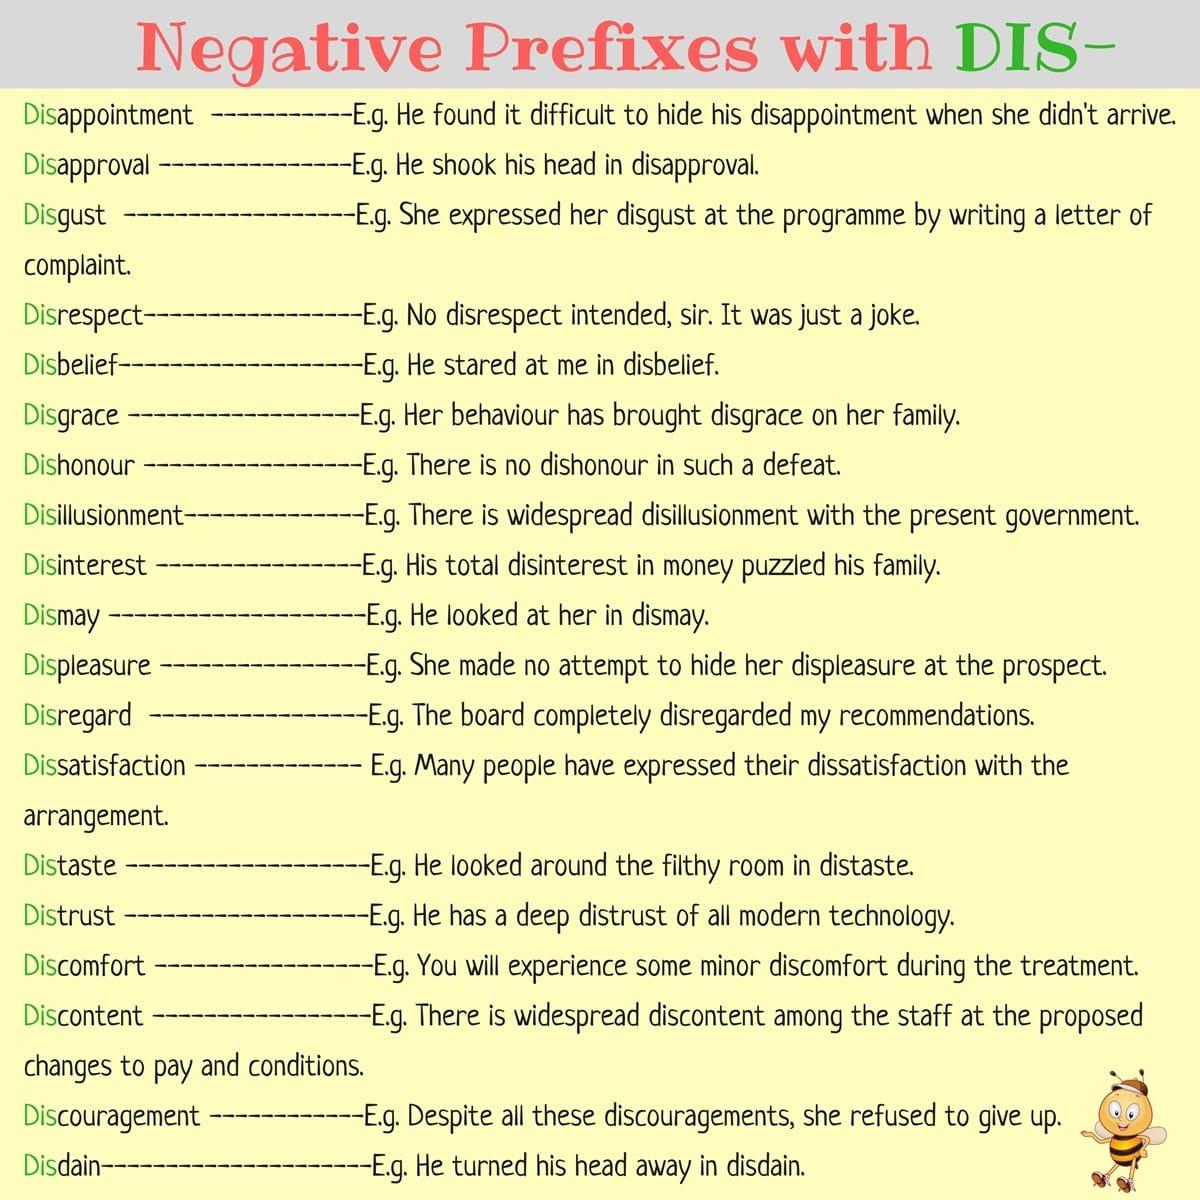 Negative Prefixes: DIS-